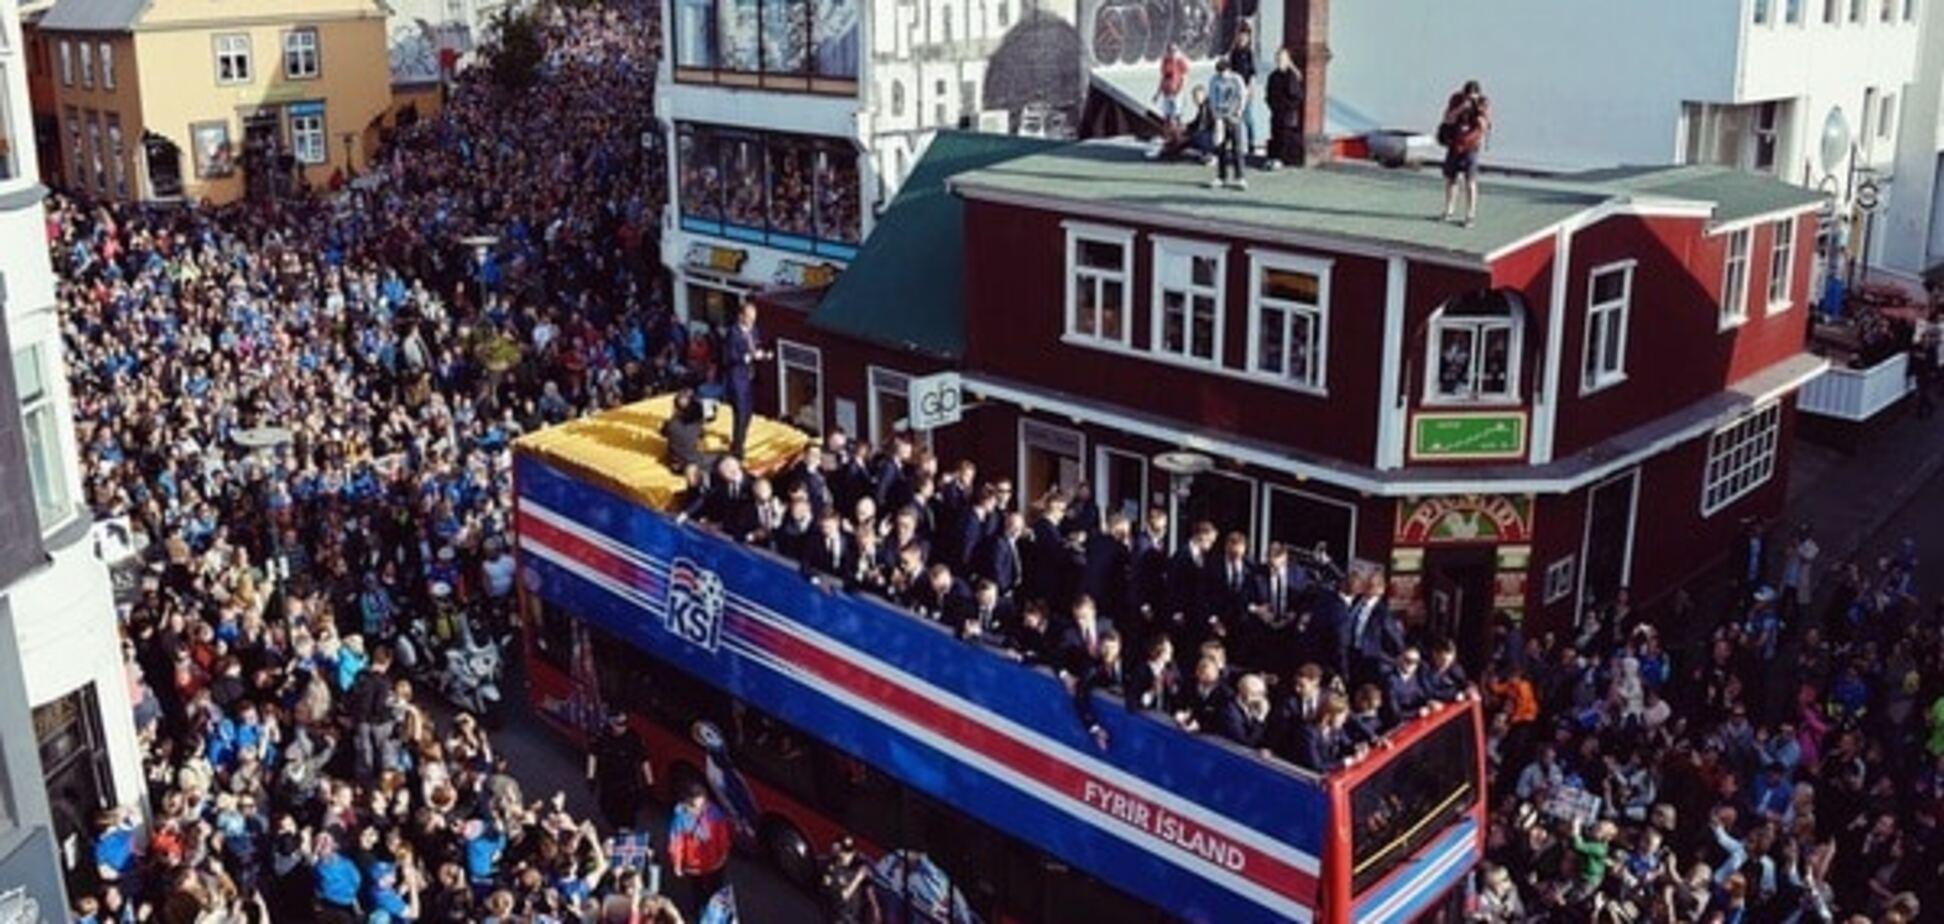 збірна Ісландії